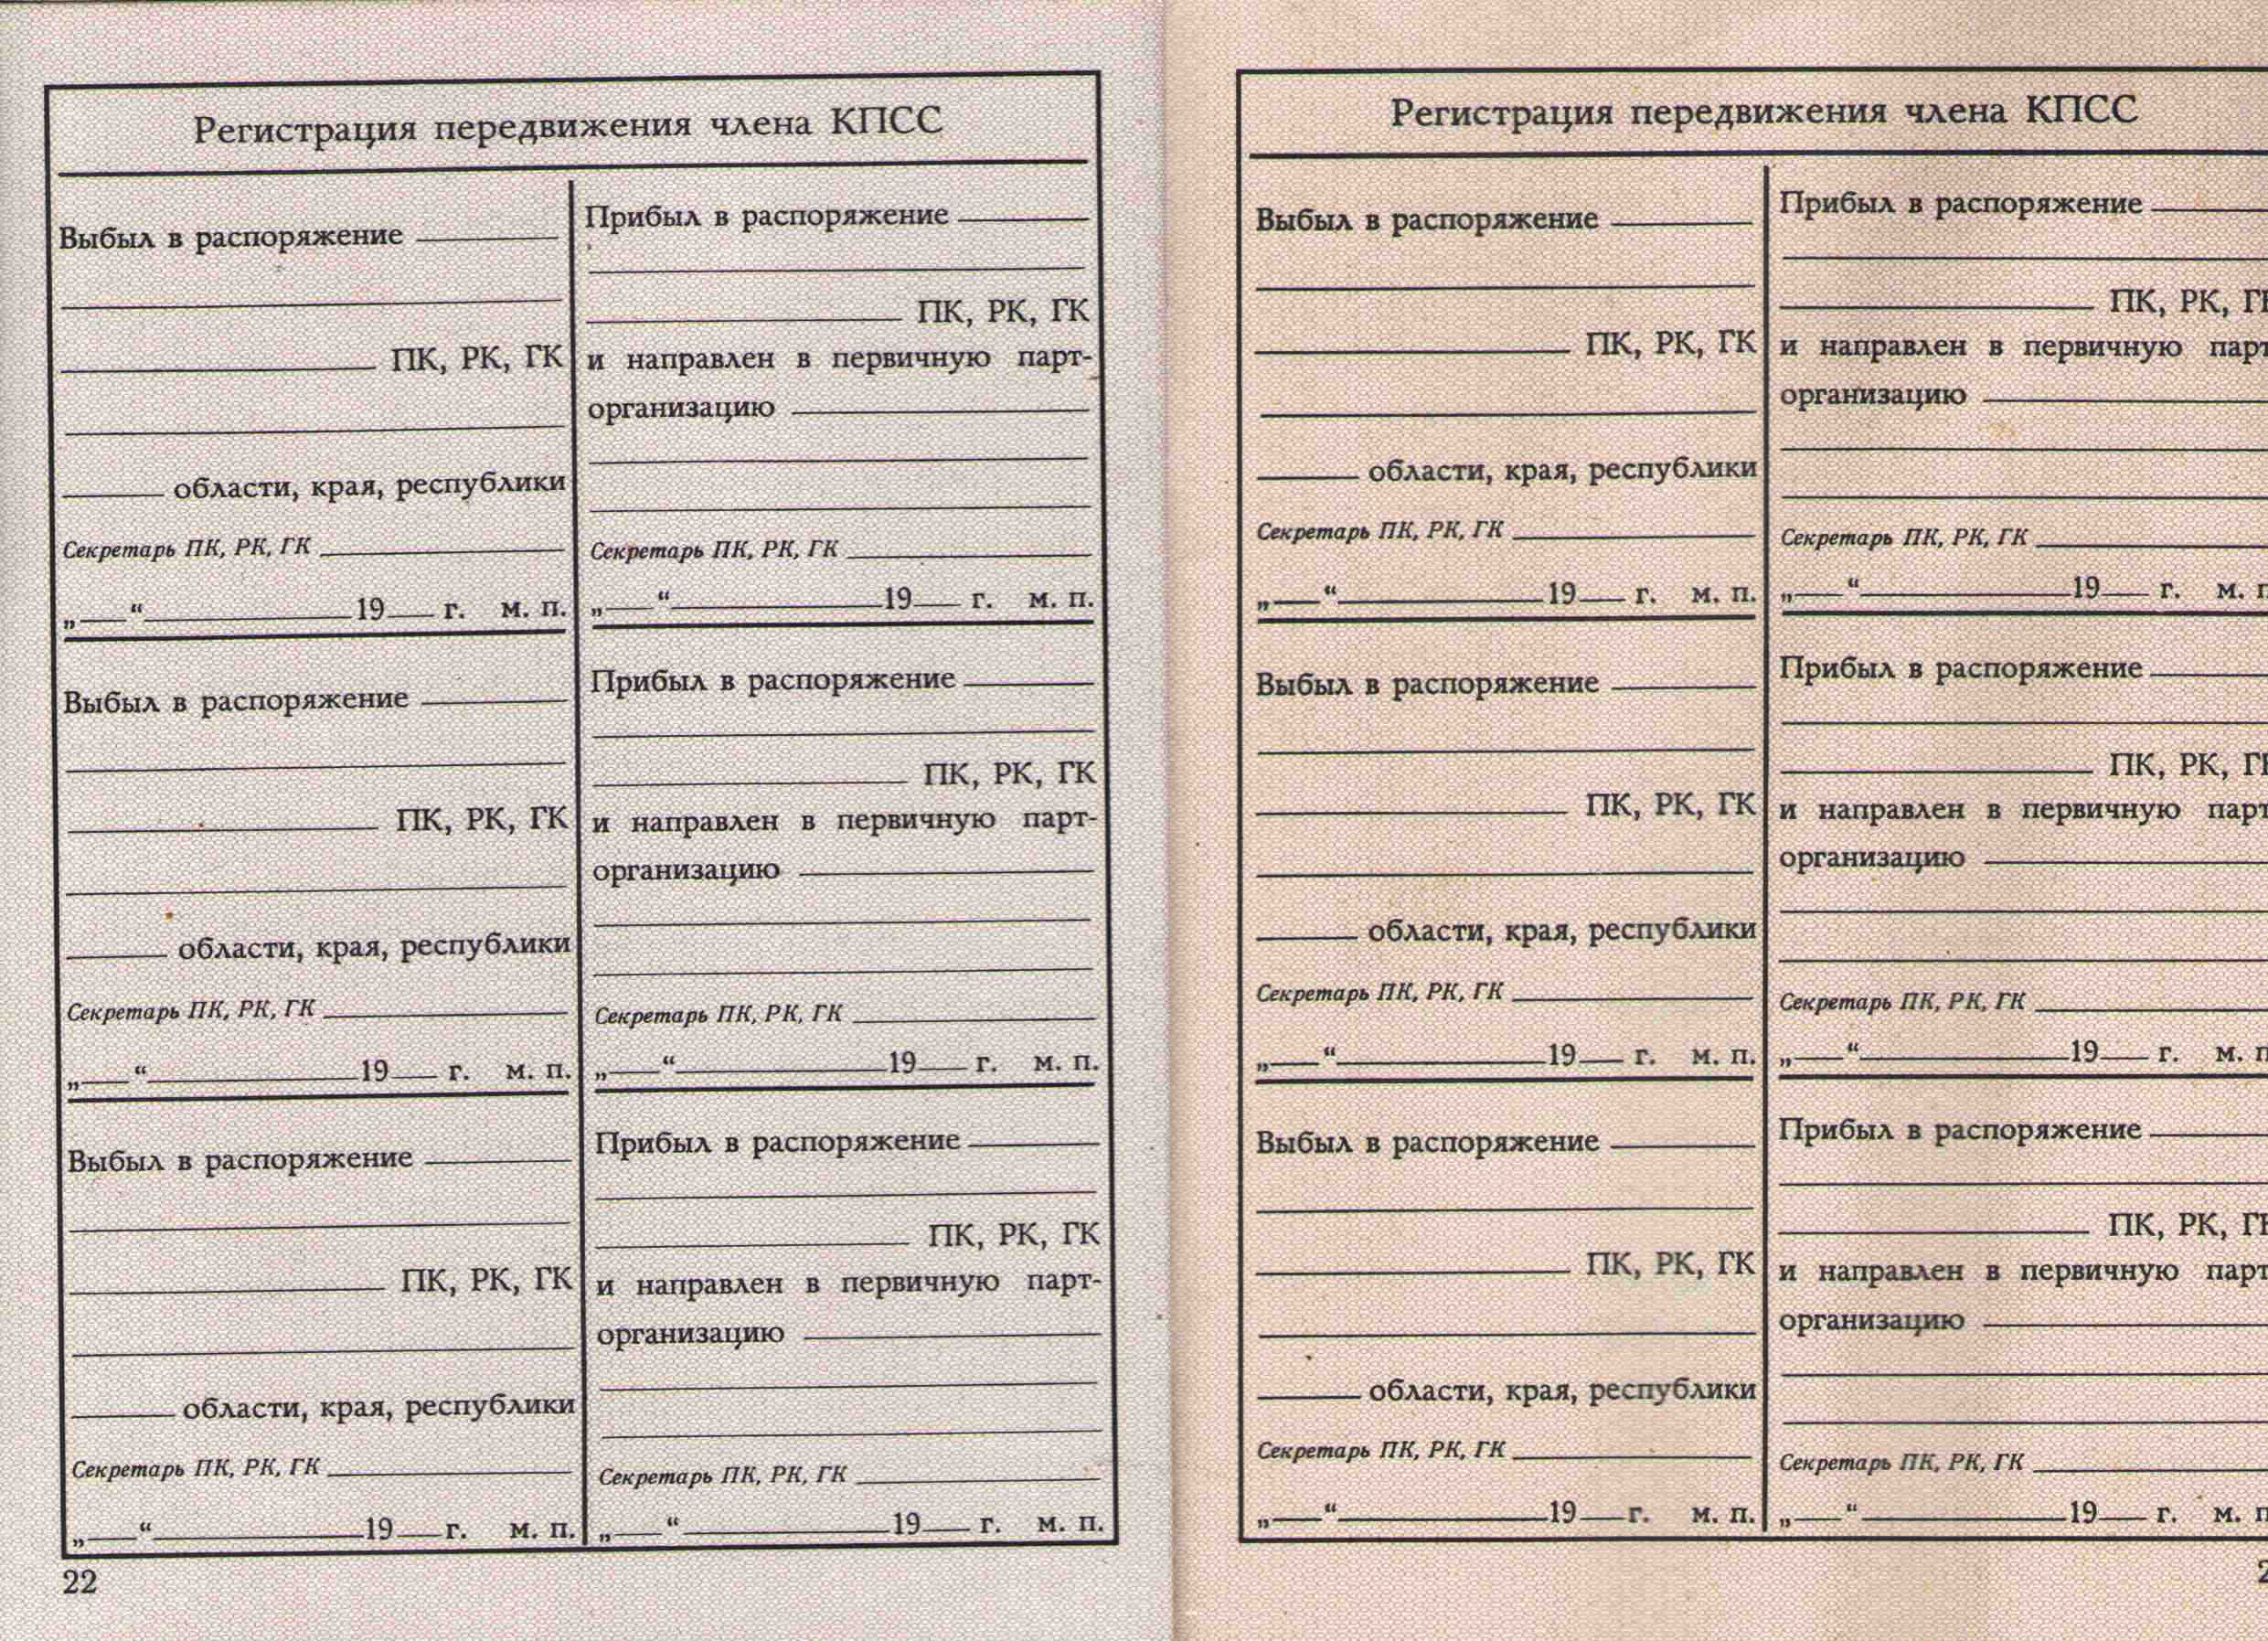 90. Учетная карточка члена партии Барыкина ПП, 1974.